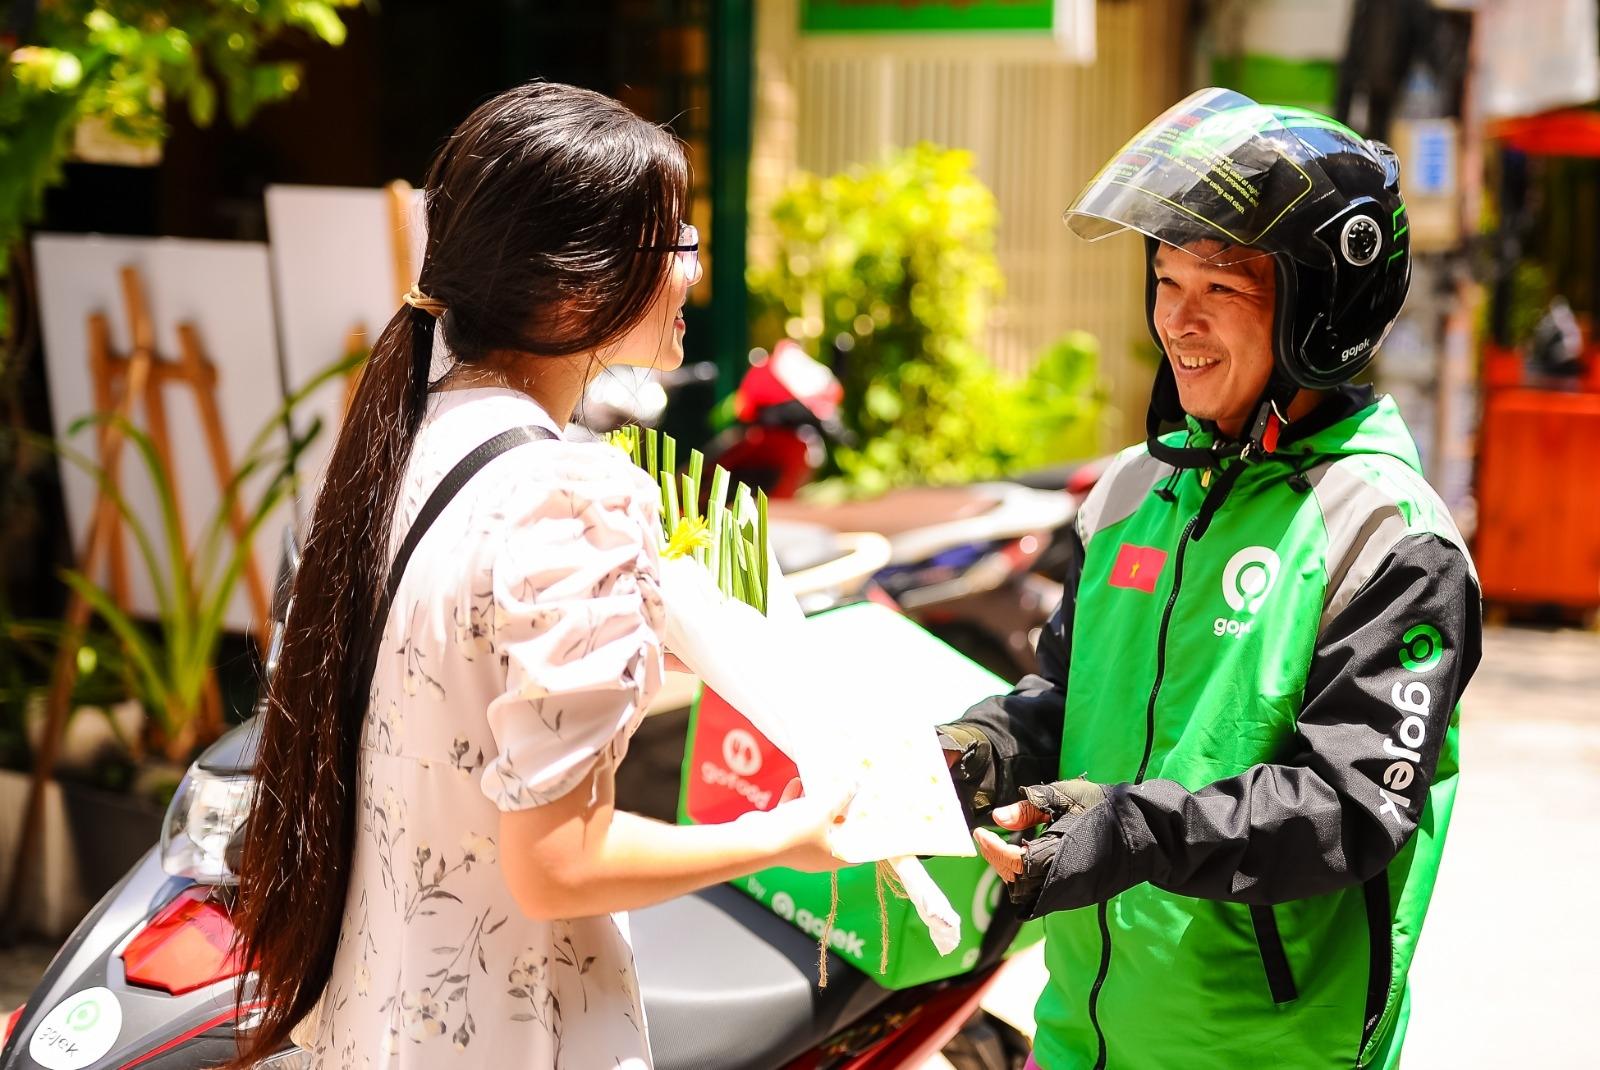 Gojek launches app and brand in Vietnam